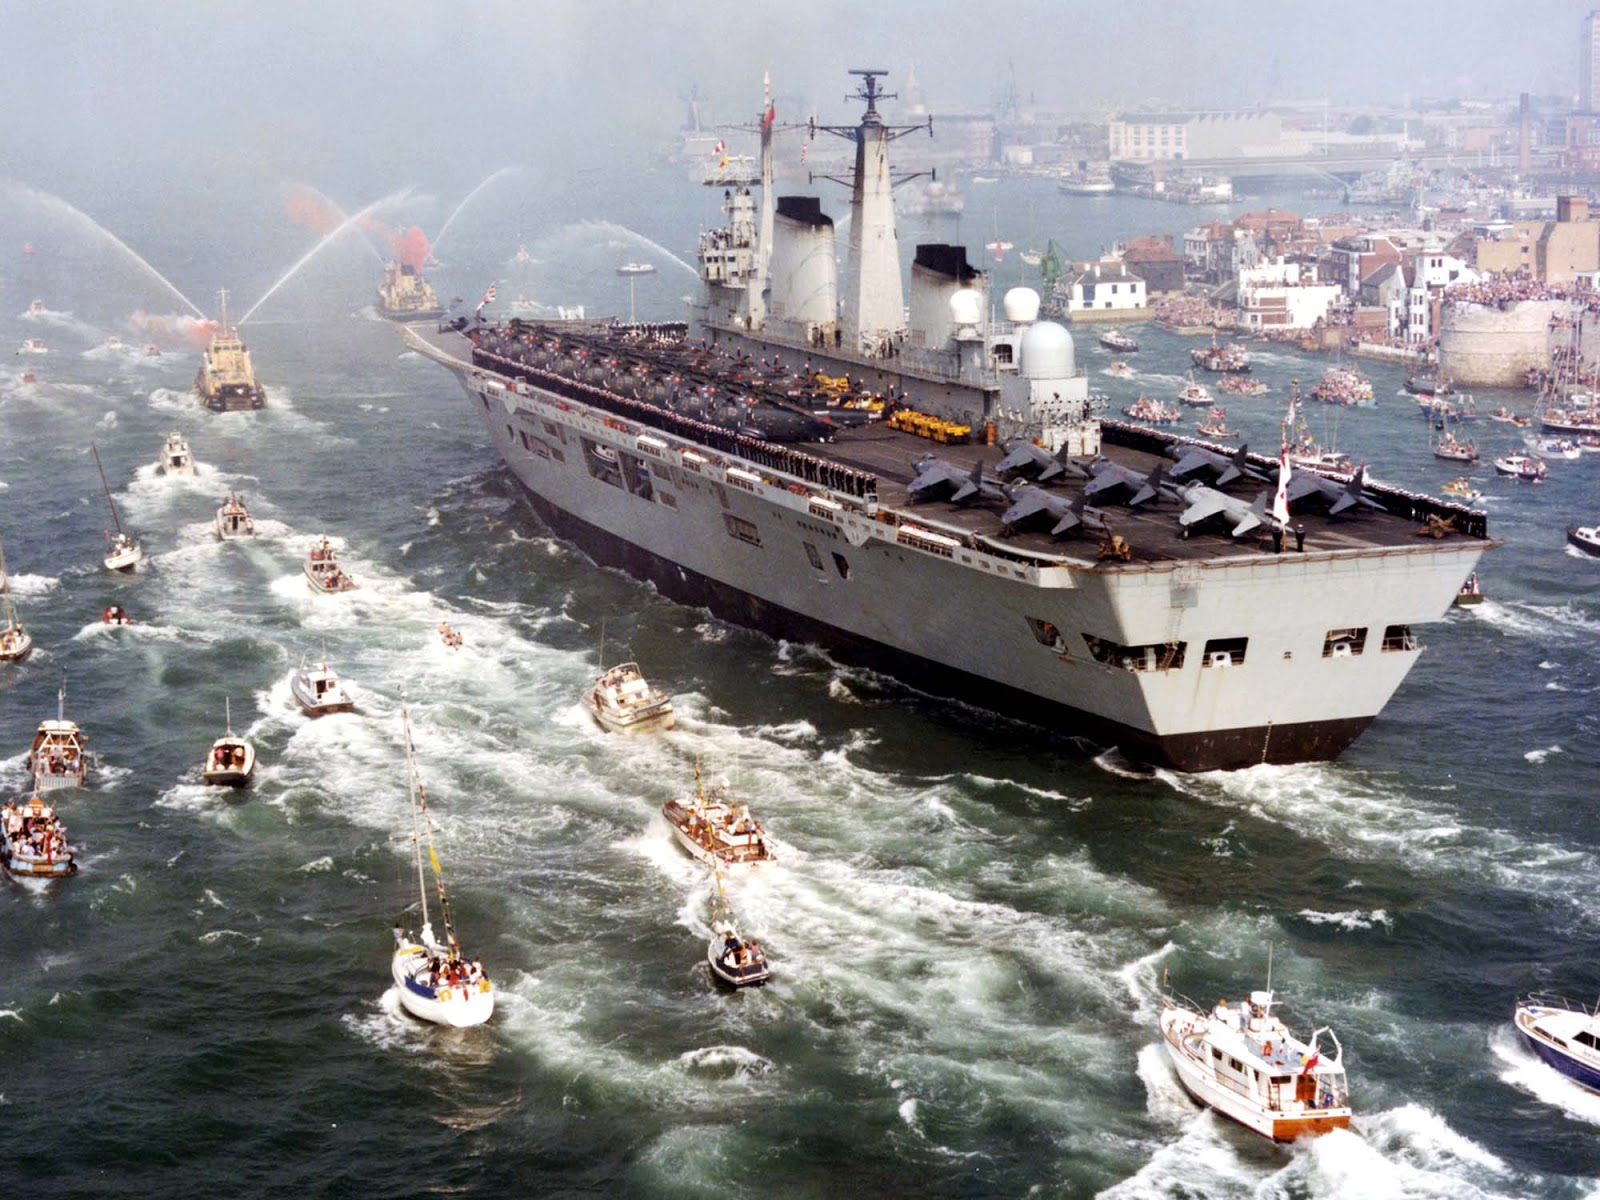 HMS Invincible returns home following the Falklands War, 1982